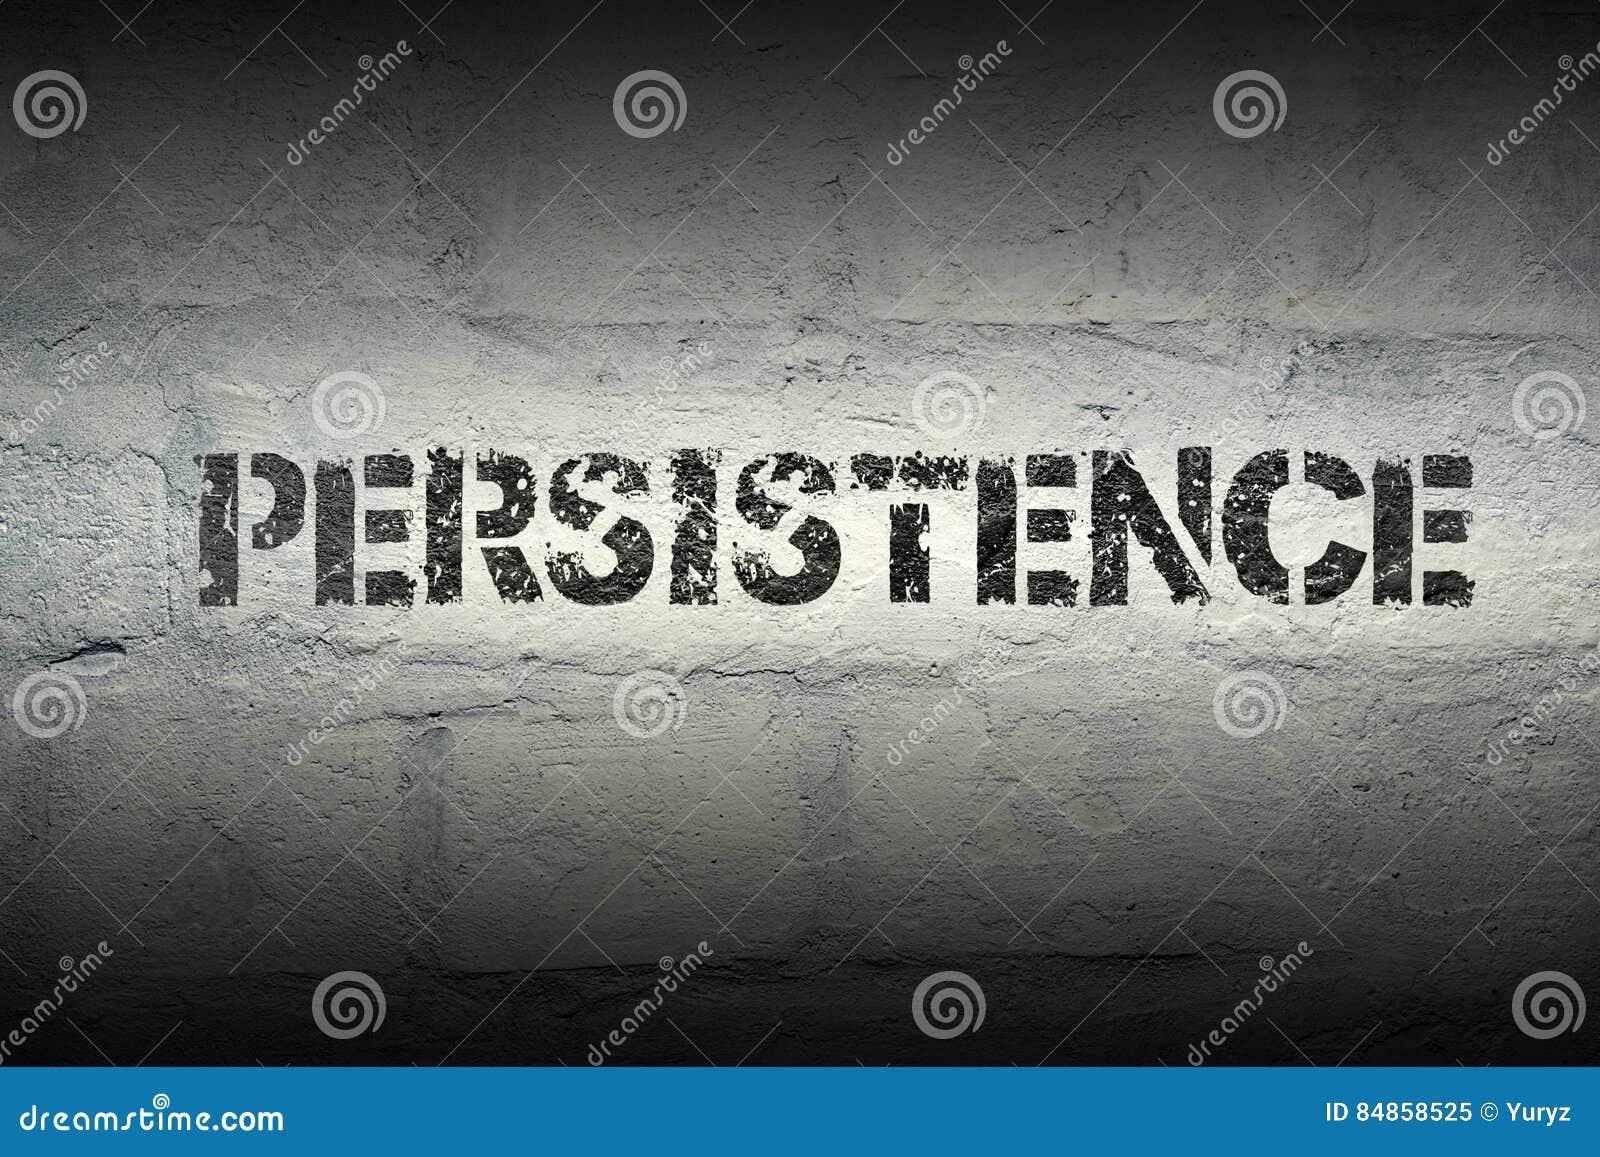 Persistance WORD GR